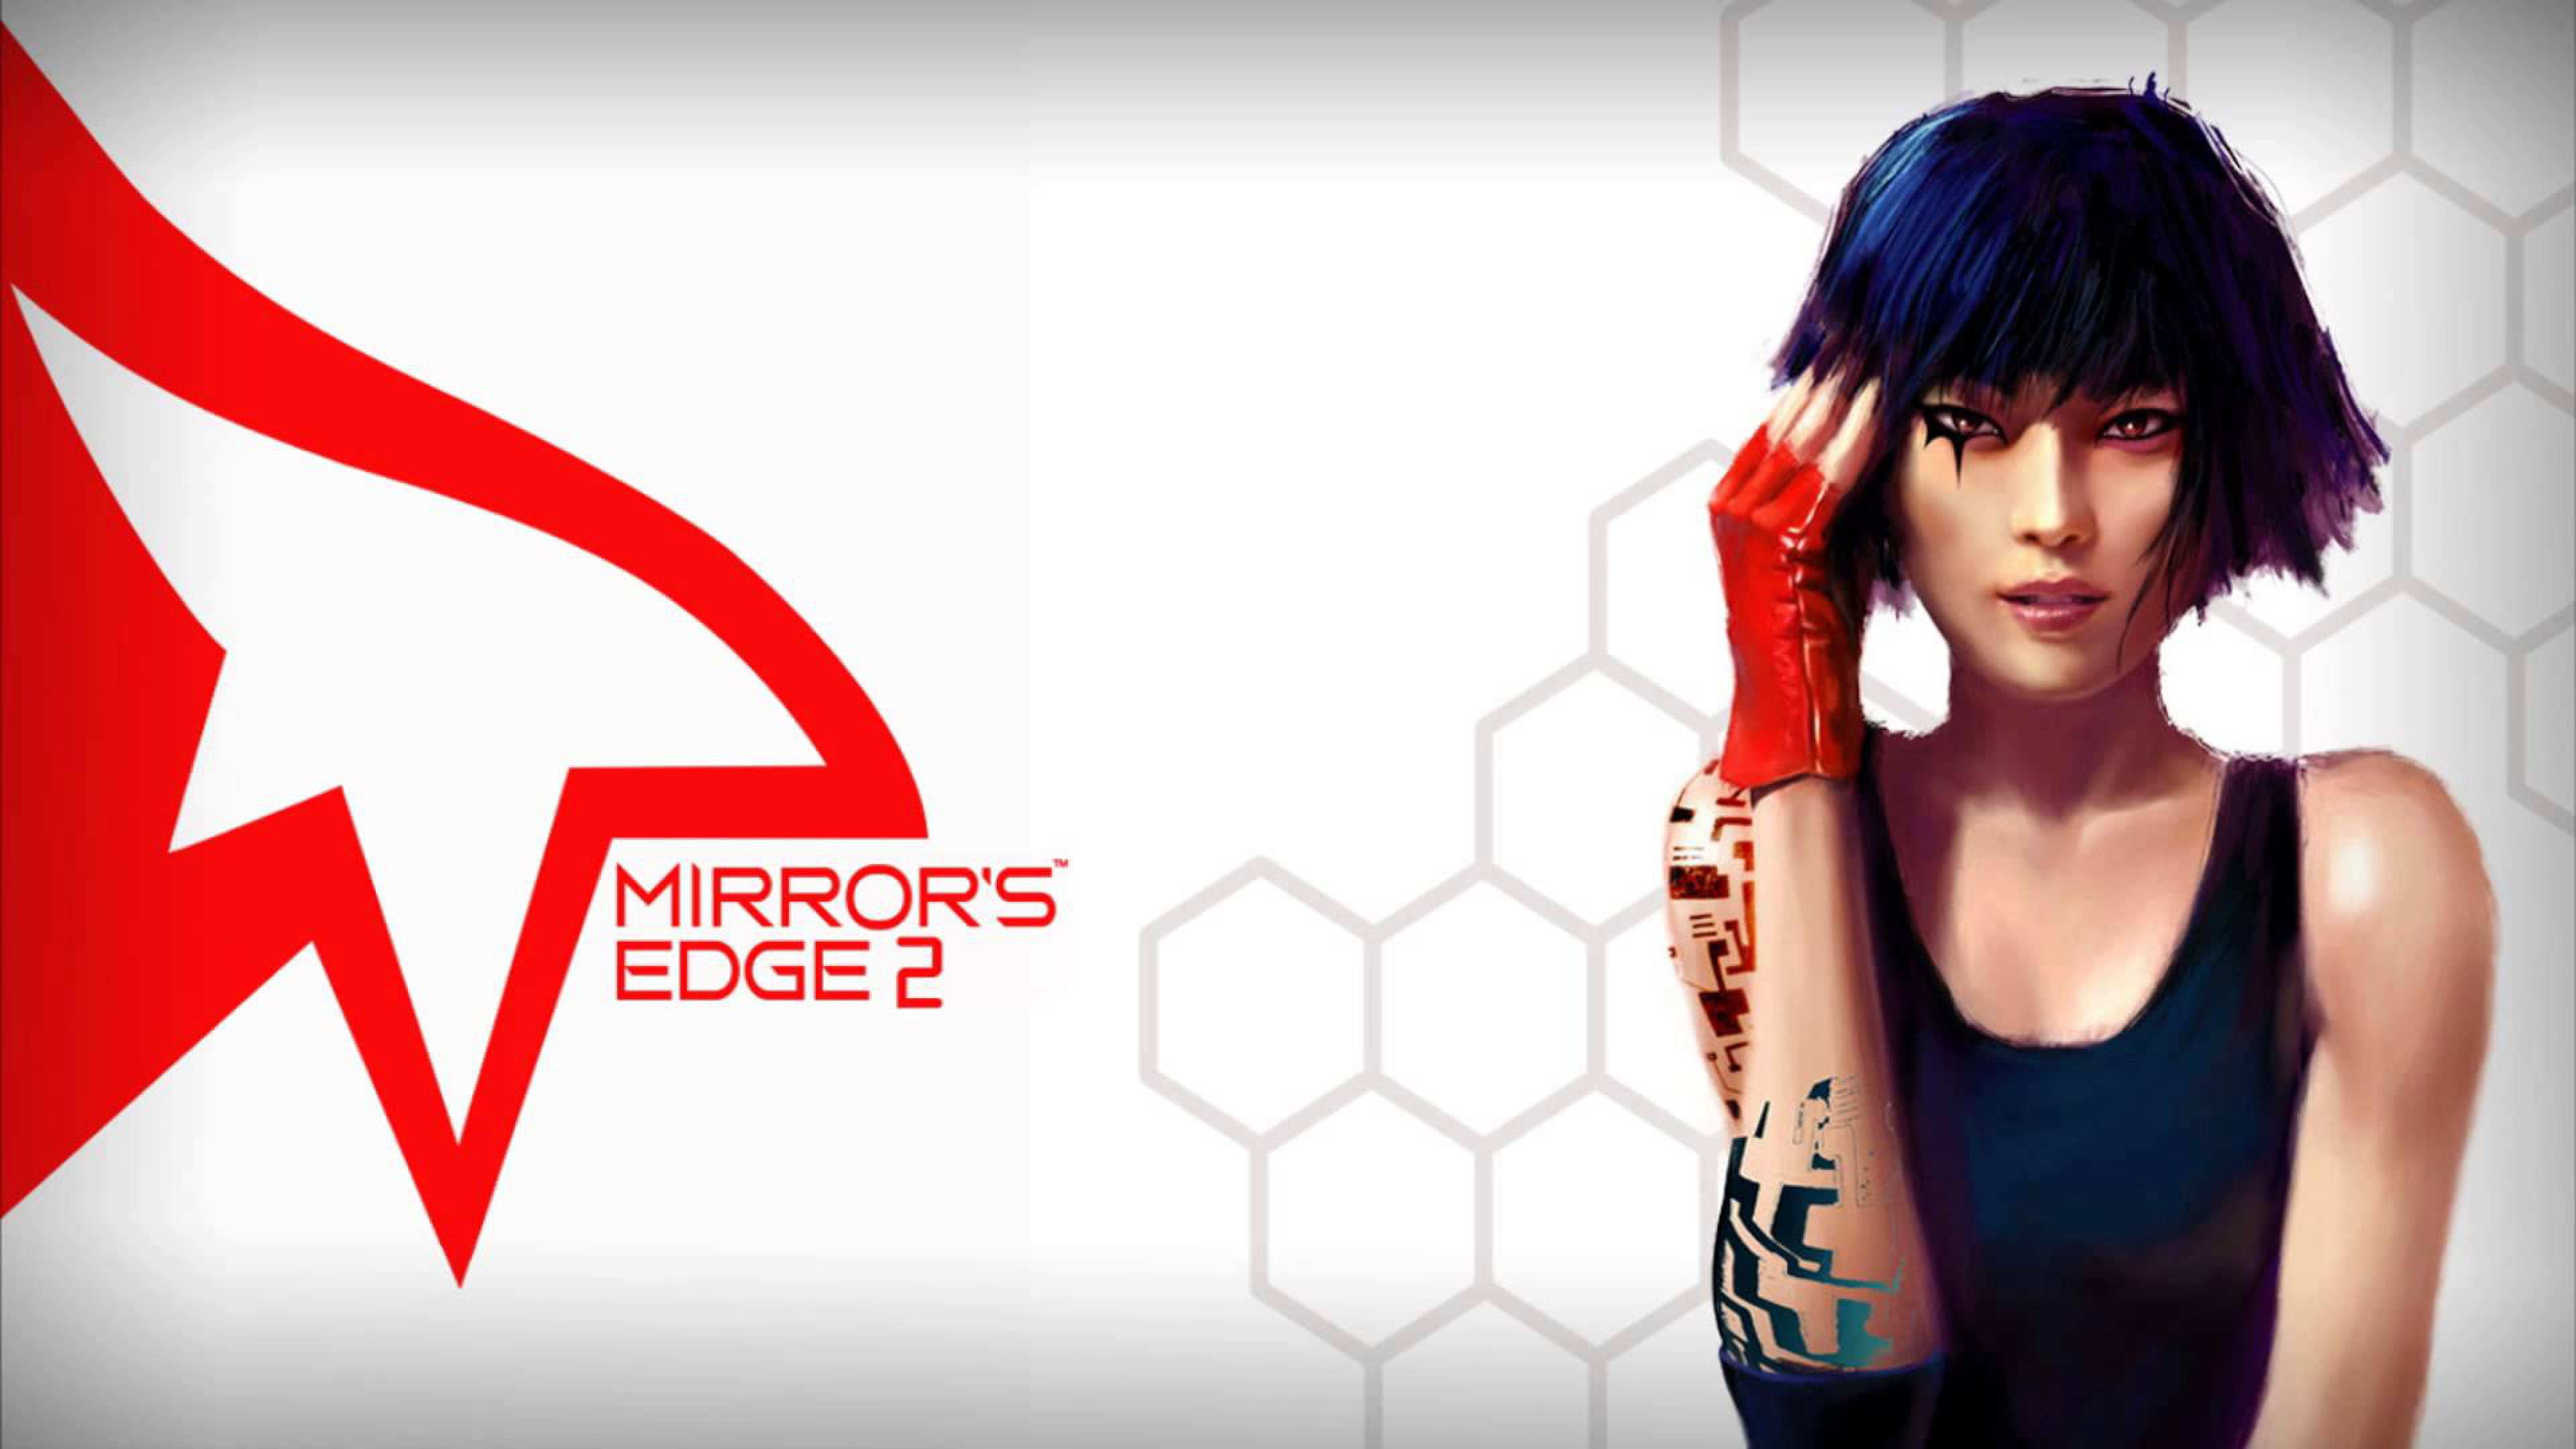 mirrors edge 1535966488 - Mirrors edge - mirrors edge wallpapers, games wallpapers, ea games wallpapers